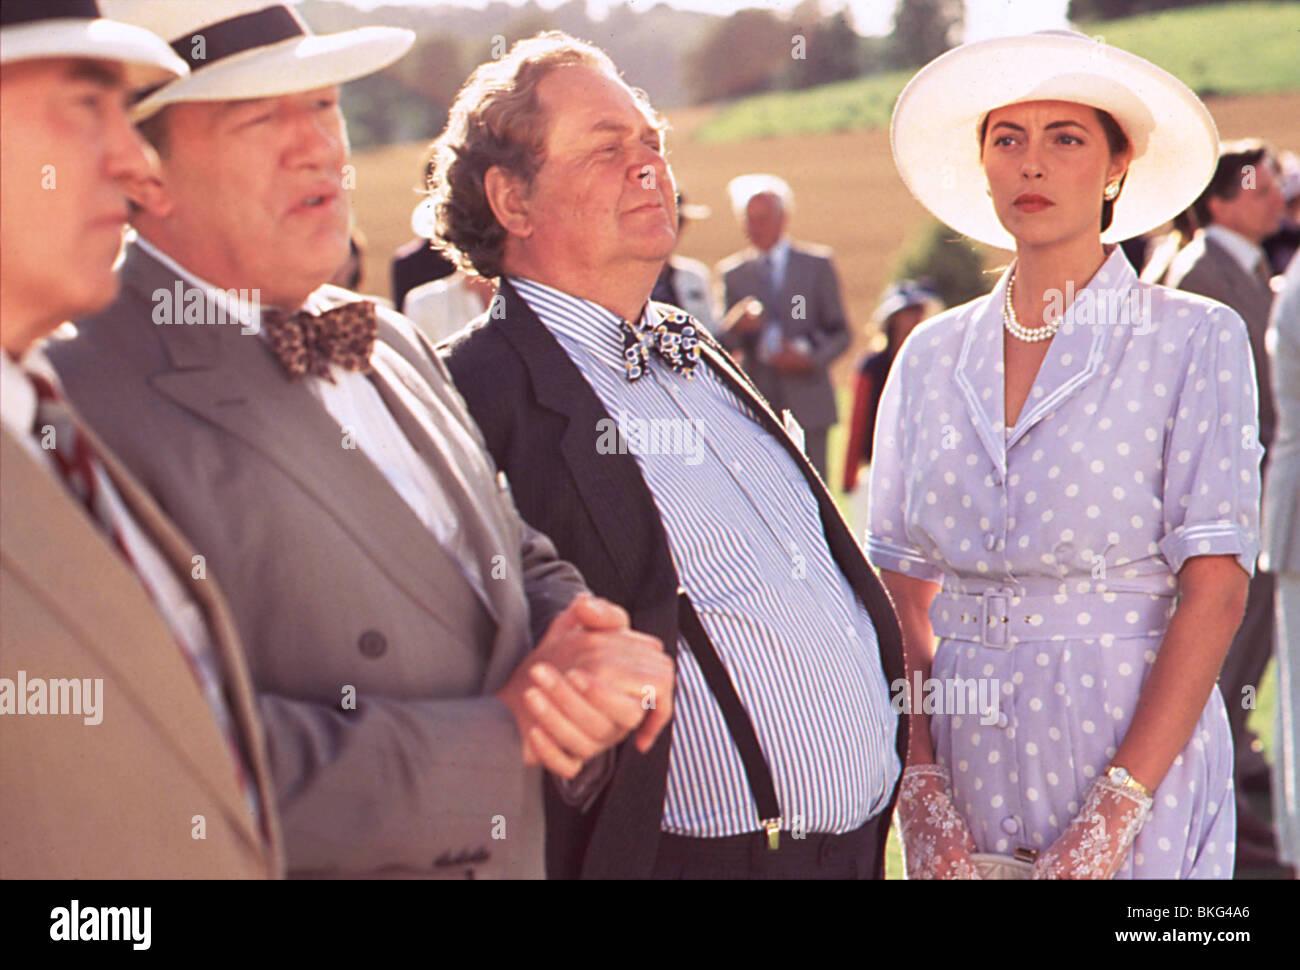 THE BROWNING VERSION (1993) GRETA SCACCHI BRWV 036 - Stock Image